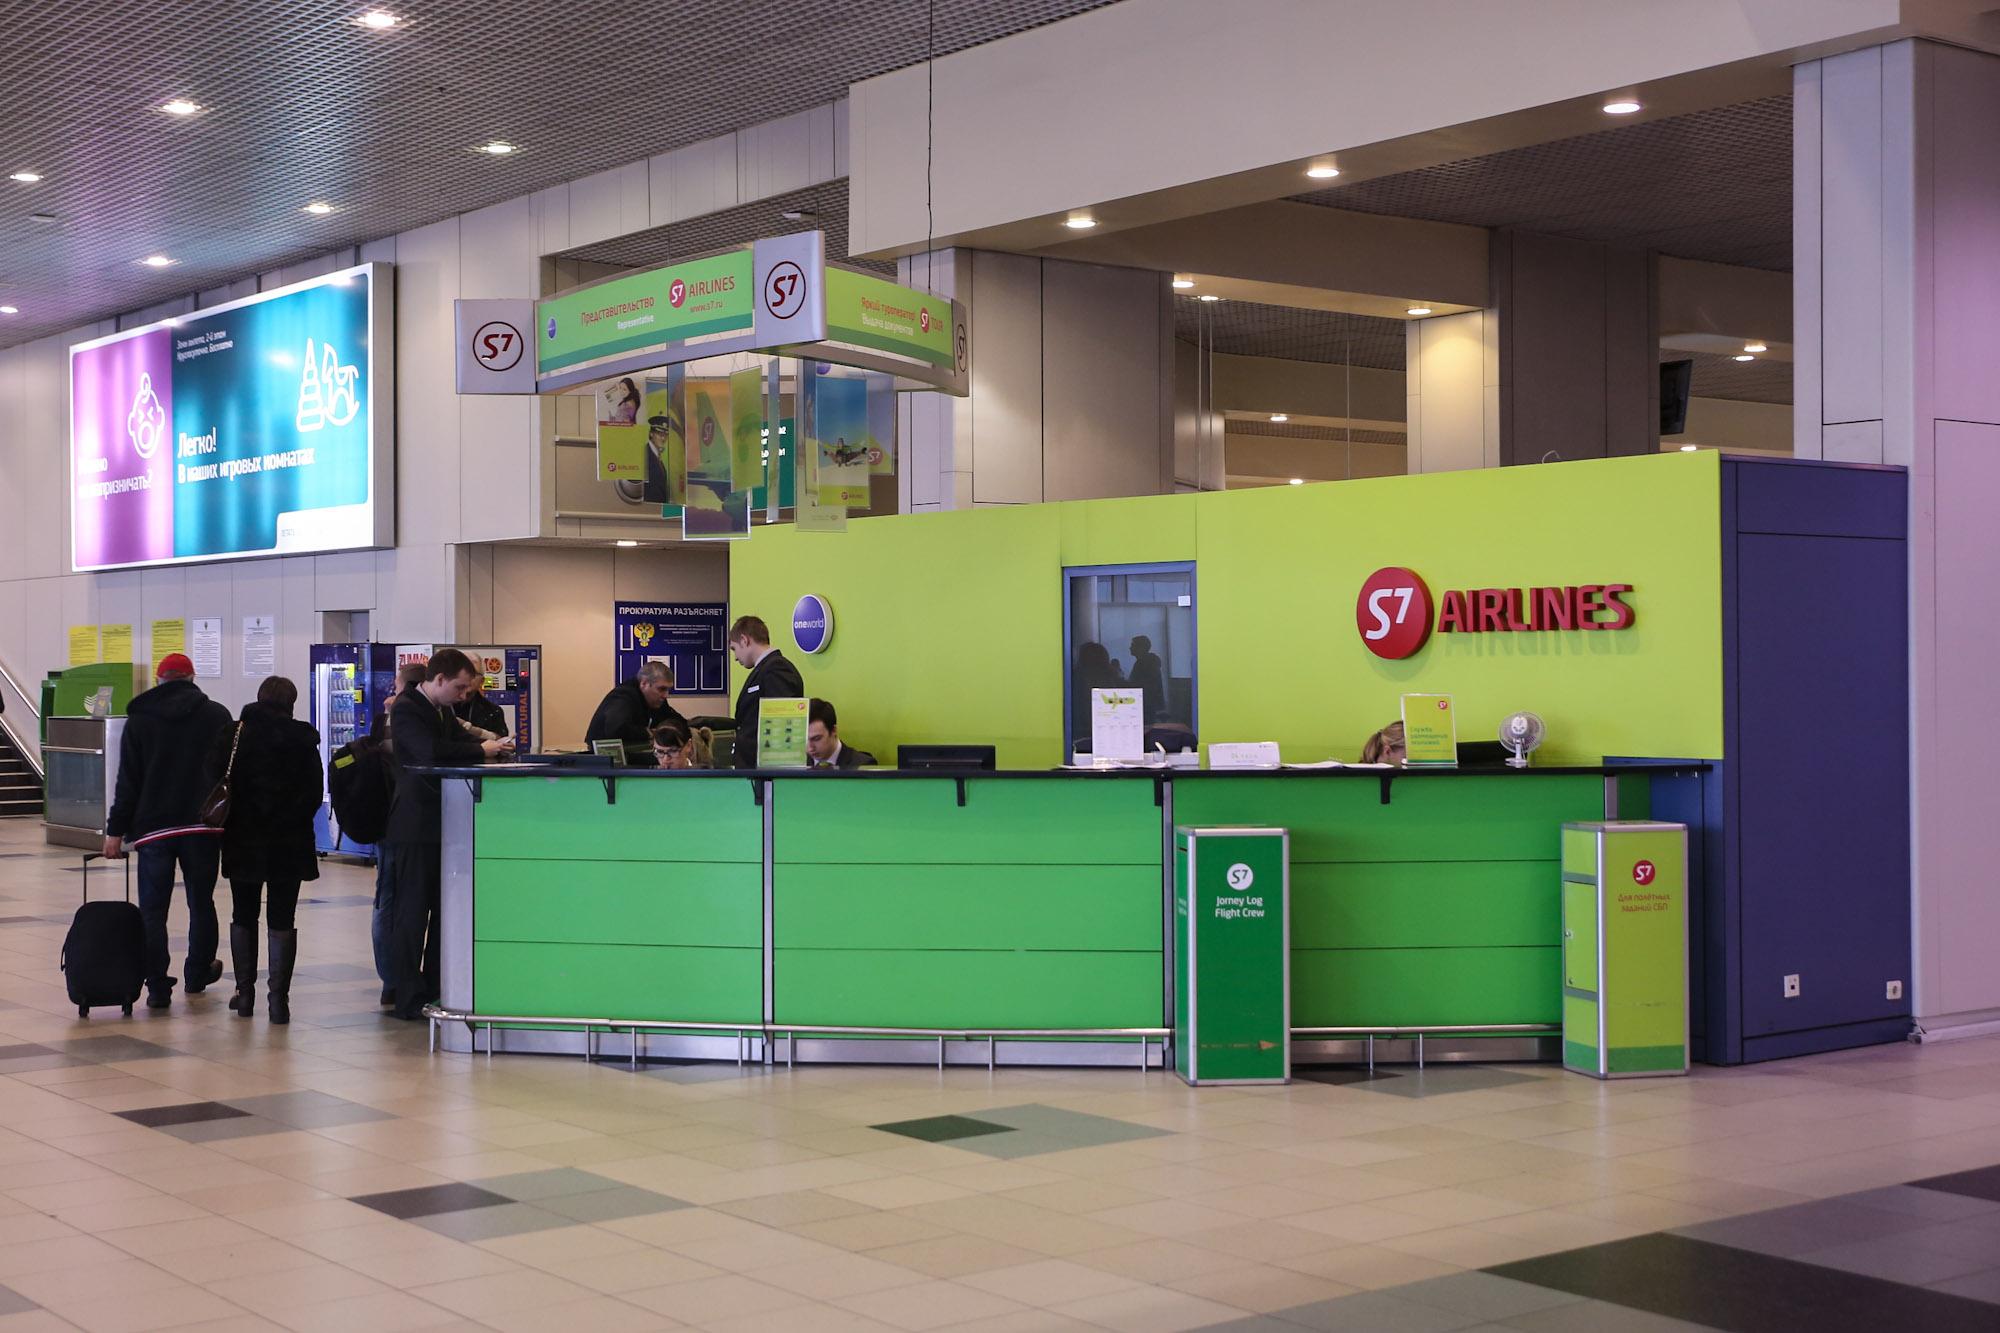 Представительство авиакомпании S7 Airlines в аэропорту Домодедово